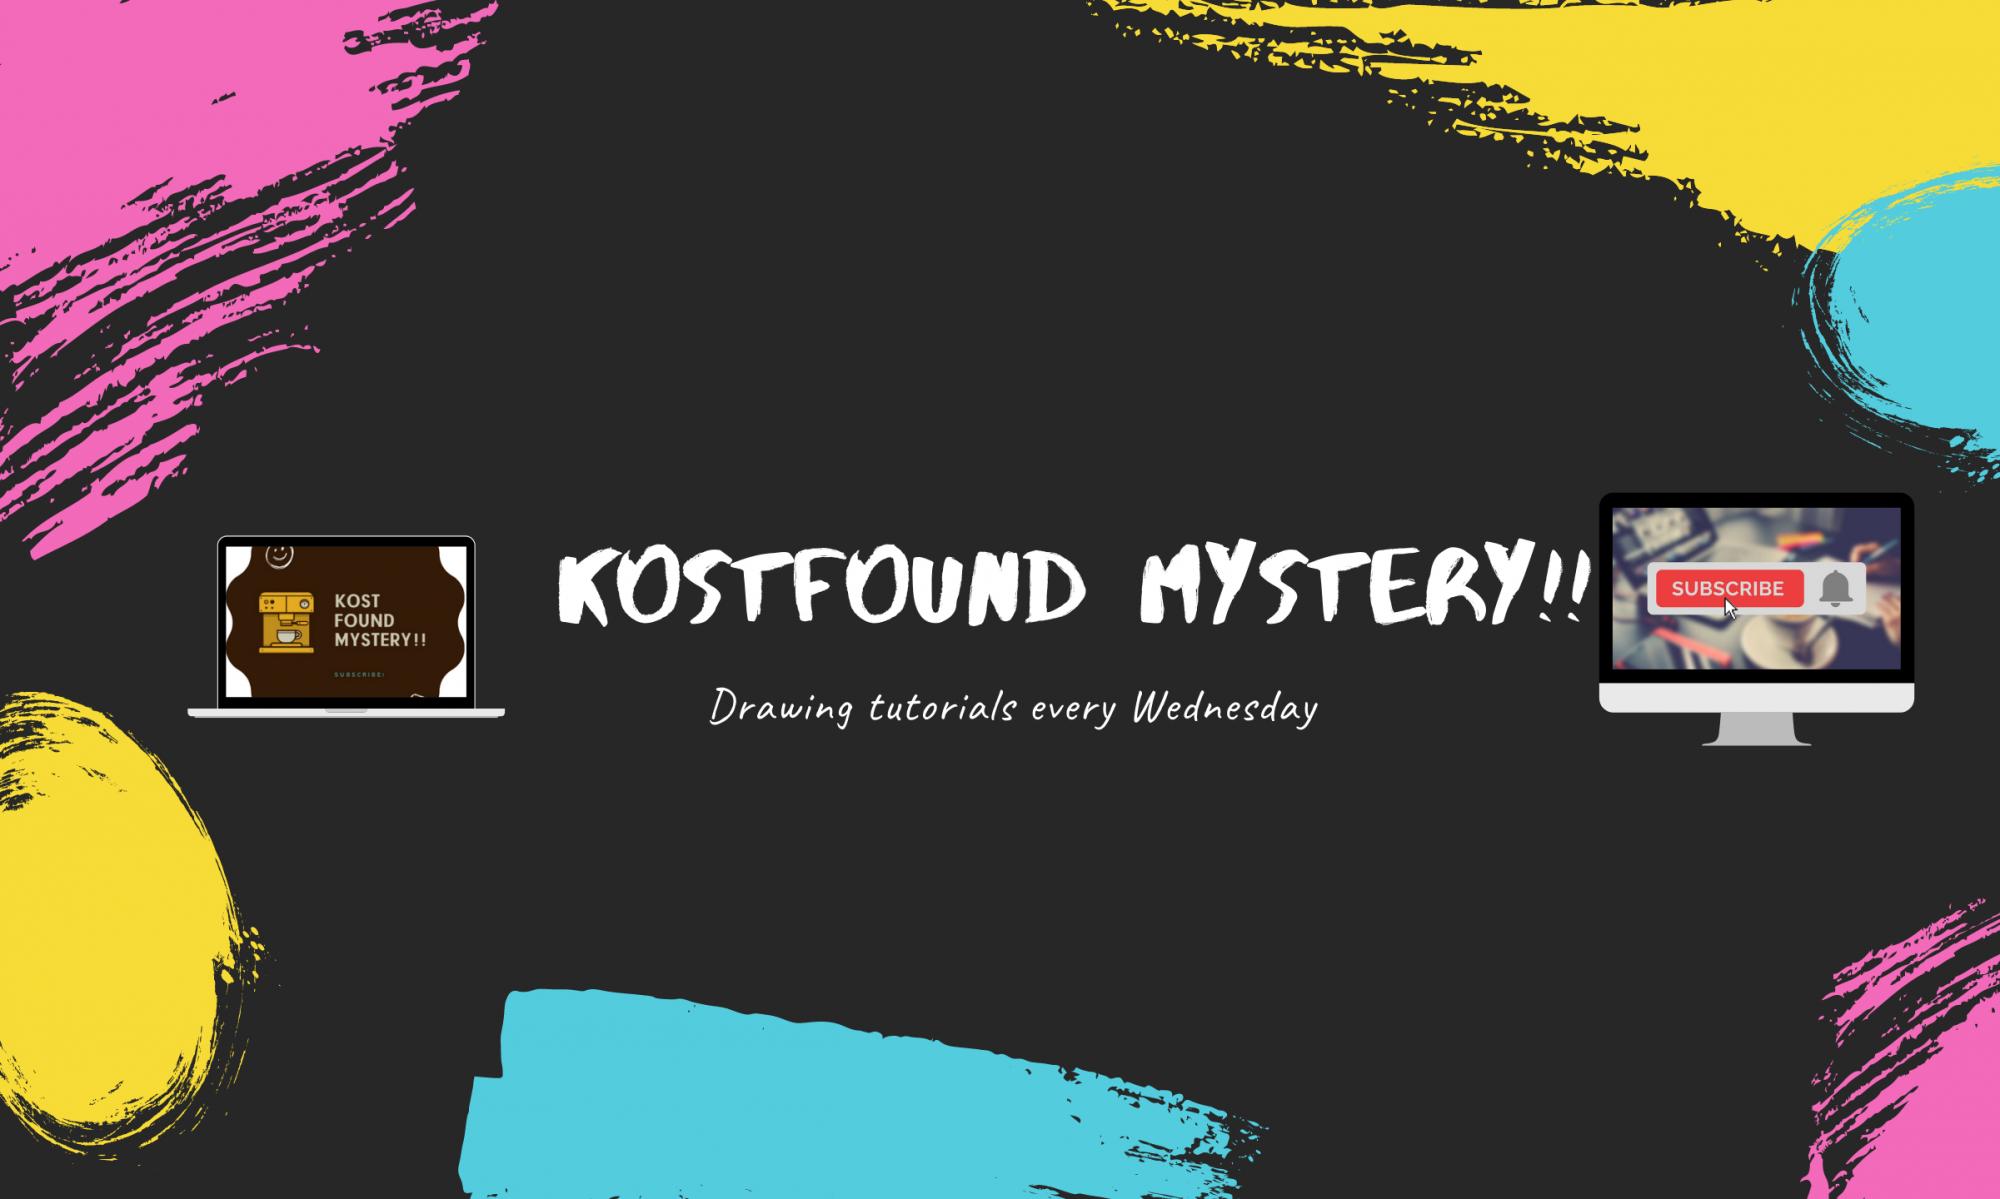 KostFound Mystery!!😀